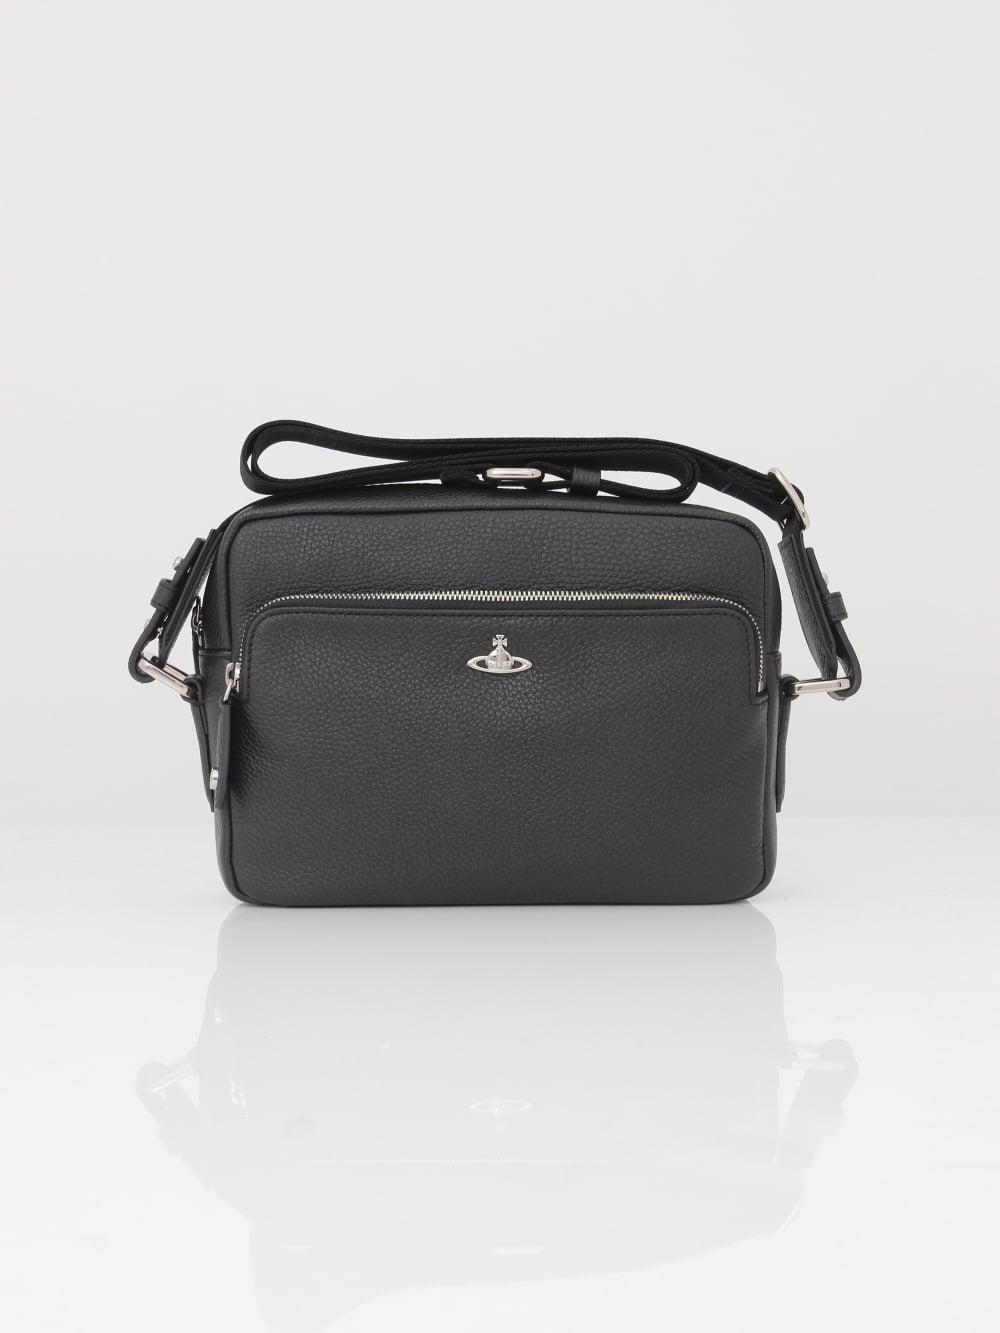 81e5dab9b6a Vivienne Westwood Milano Crossbody Bag in Black - Northern Threads